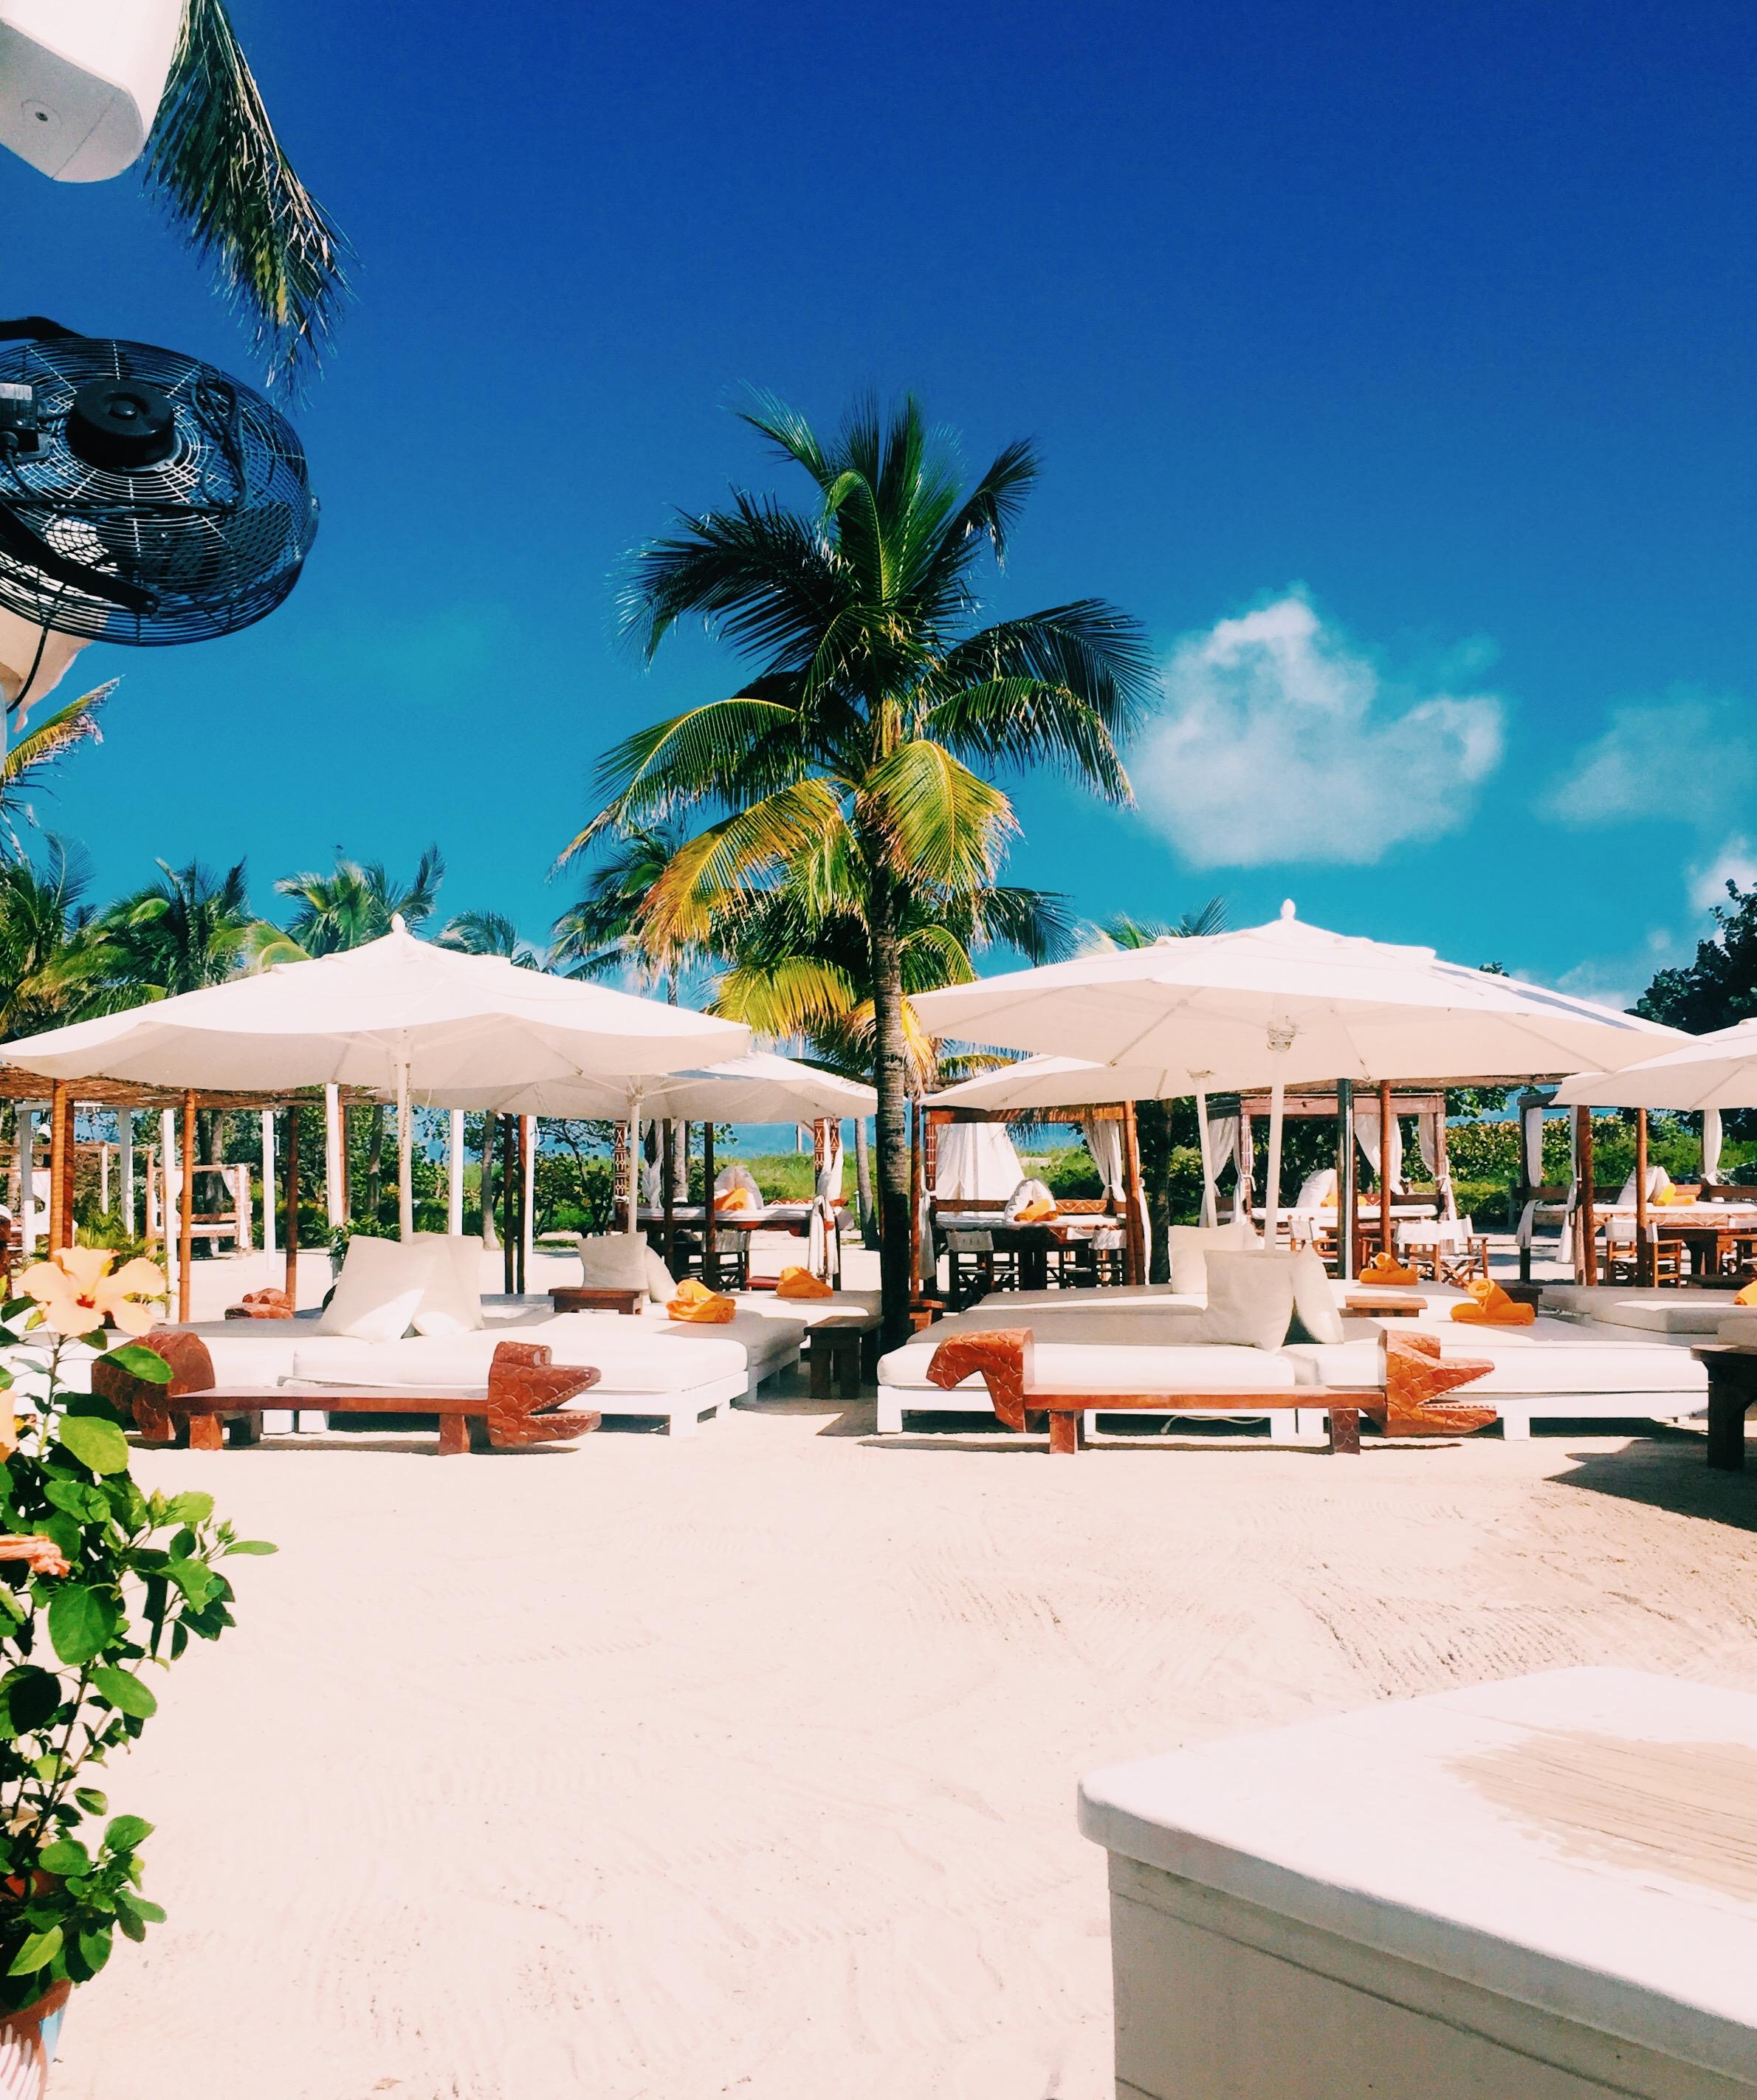 The luxurious beach club at Nikki Beach Miami